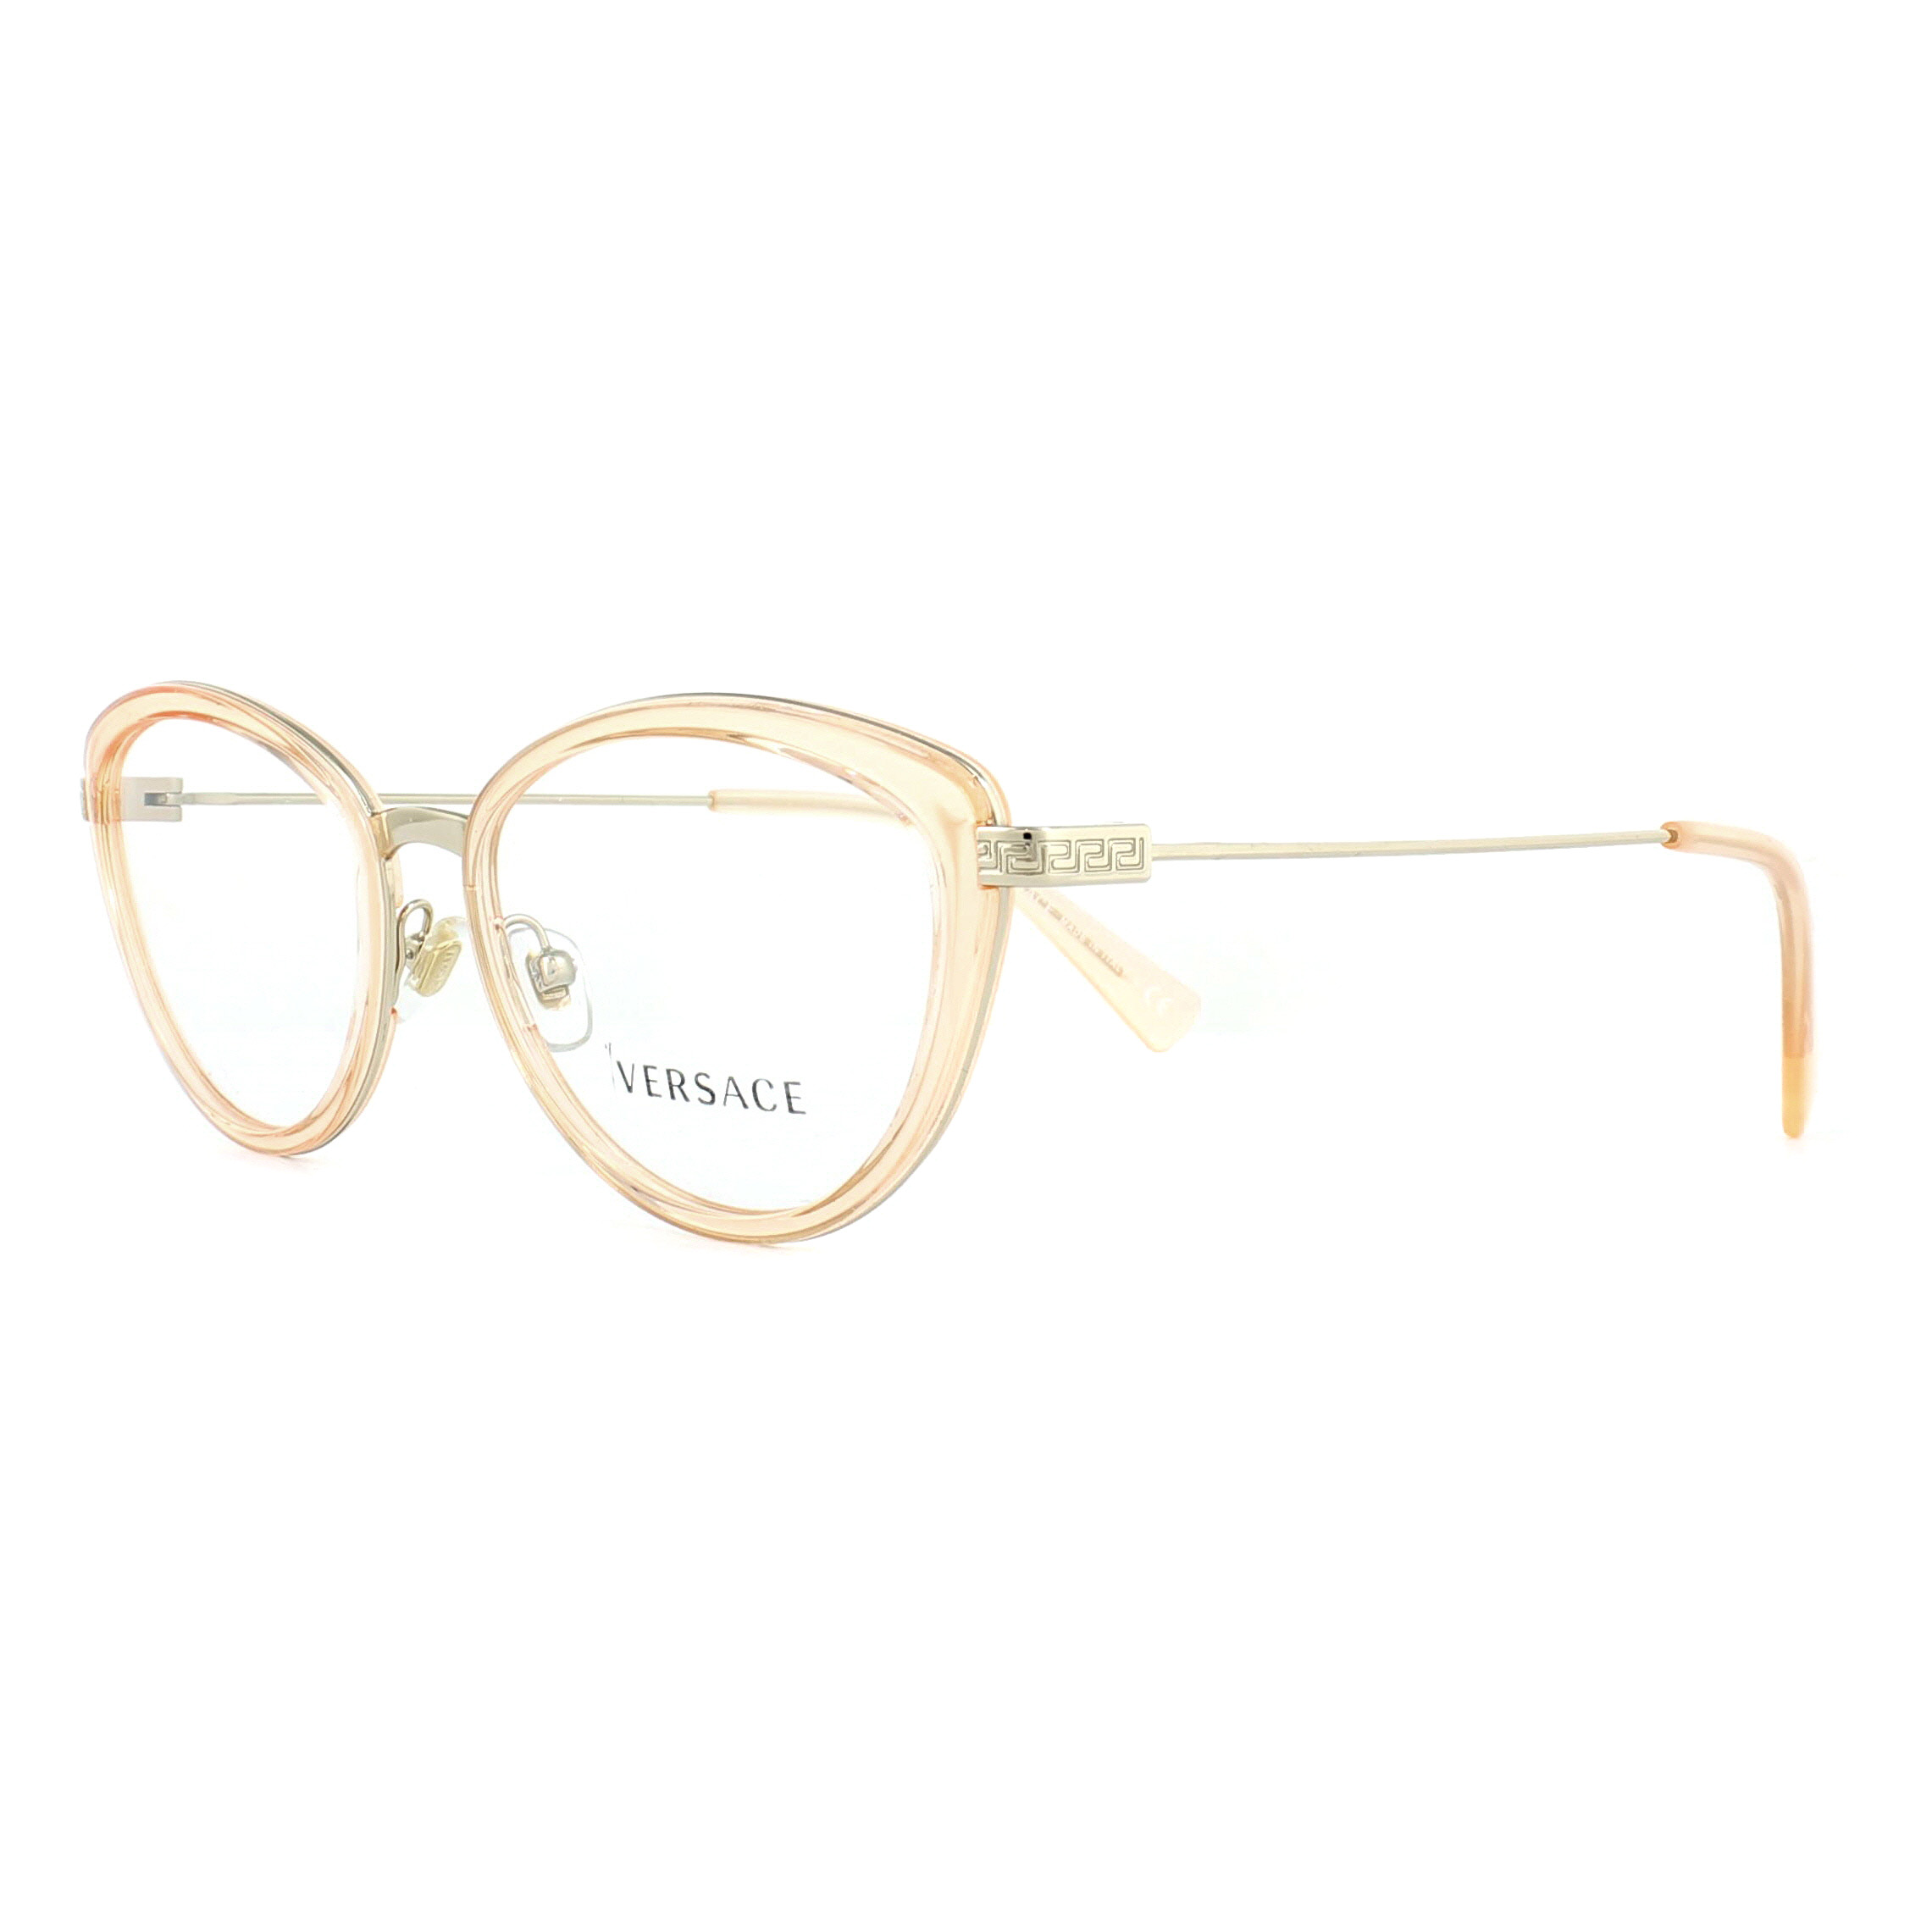 Versace Glasses Frames 1244 1406 Orange Transparent and Pale Gold ...